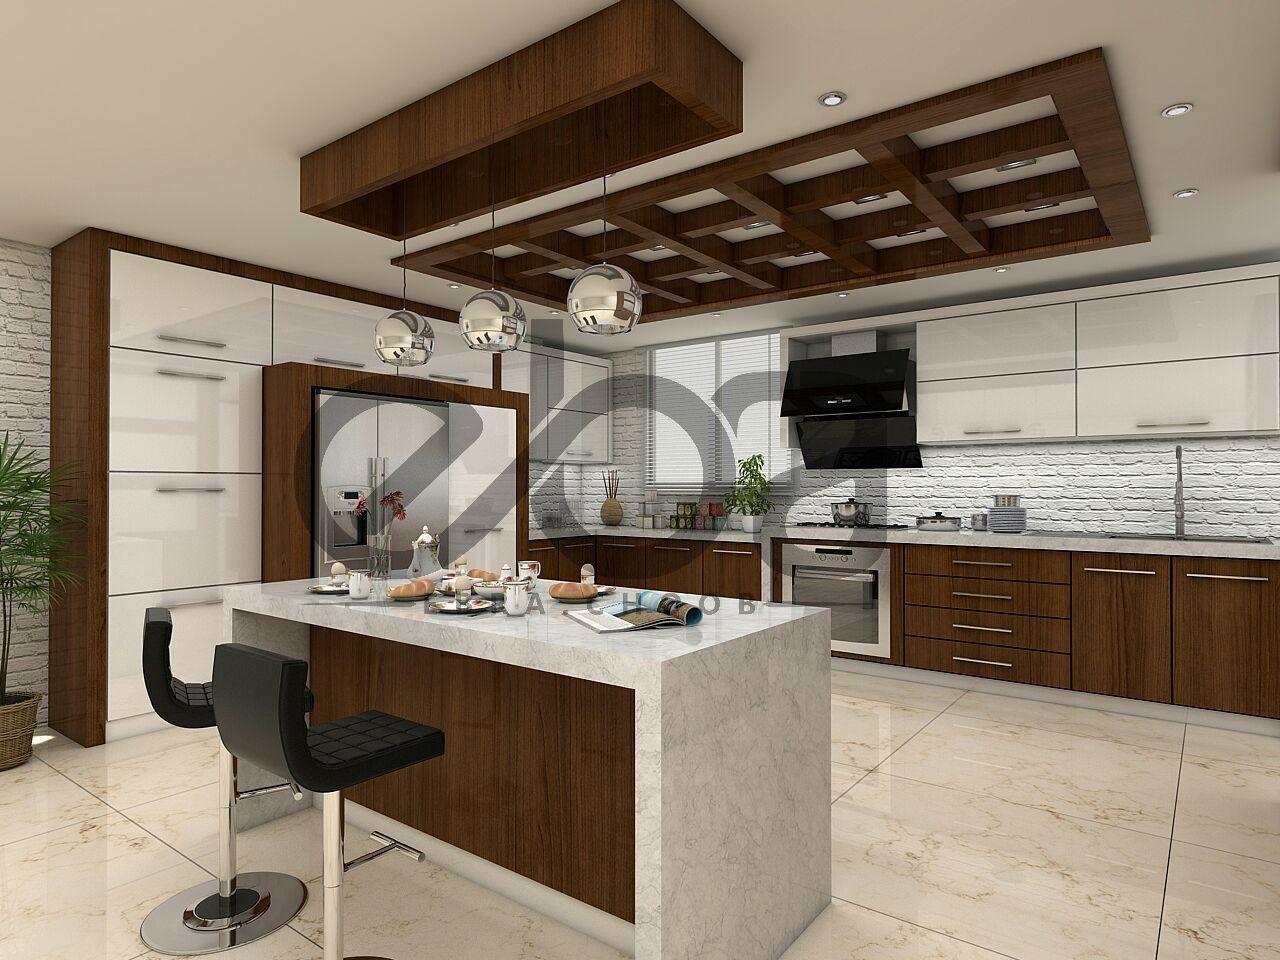 Ebrachoob Designer And Manufacturer Of Interior Decoration Location Iran Client Mr Mofidi Year 2018 ابراچوب طراح و مجری دکوراسیون د In 2020 Home Decor Kitchen Home